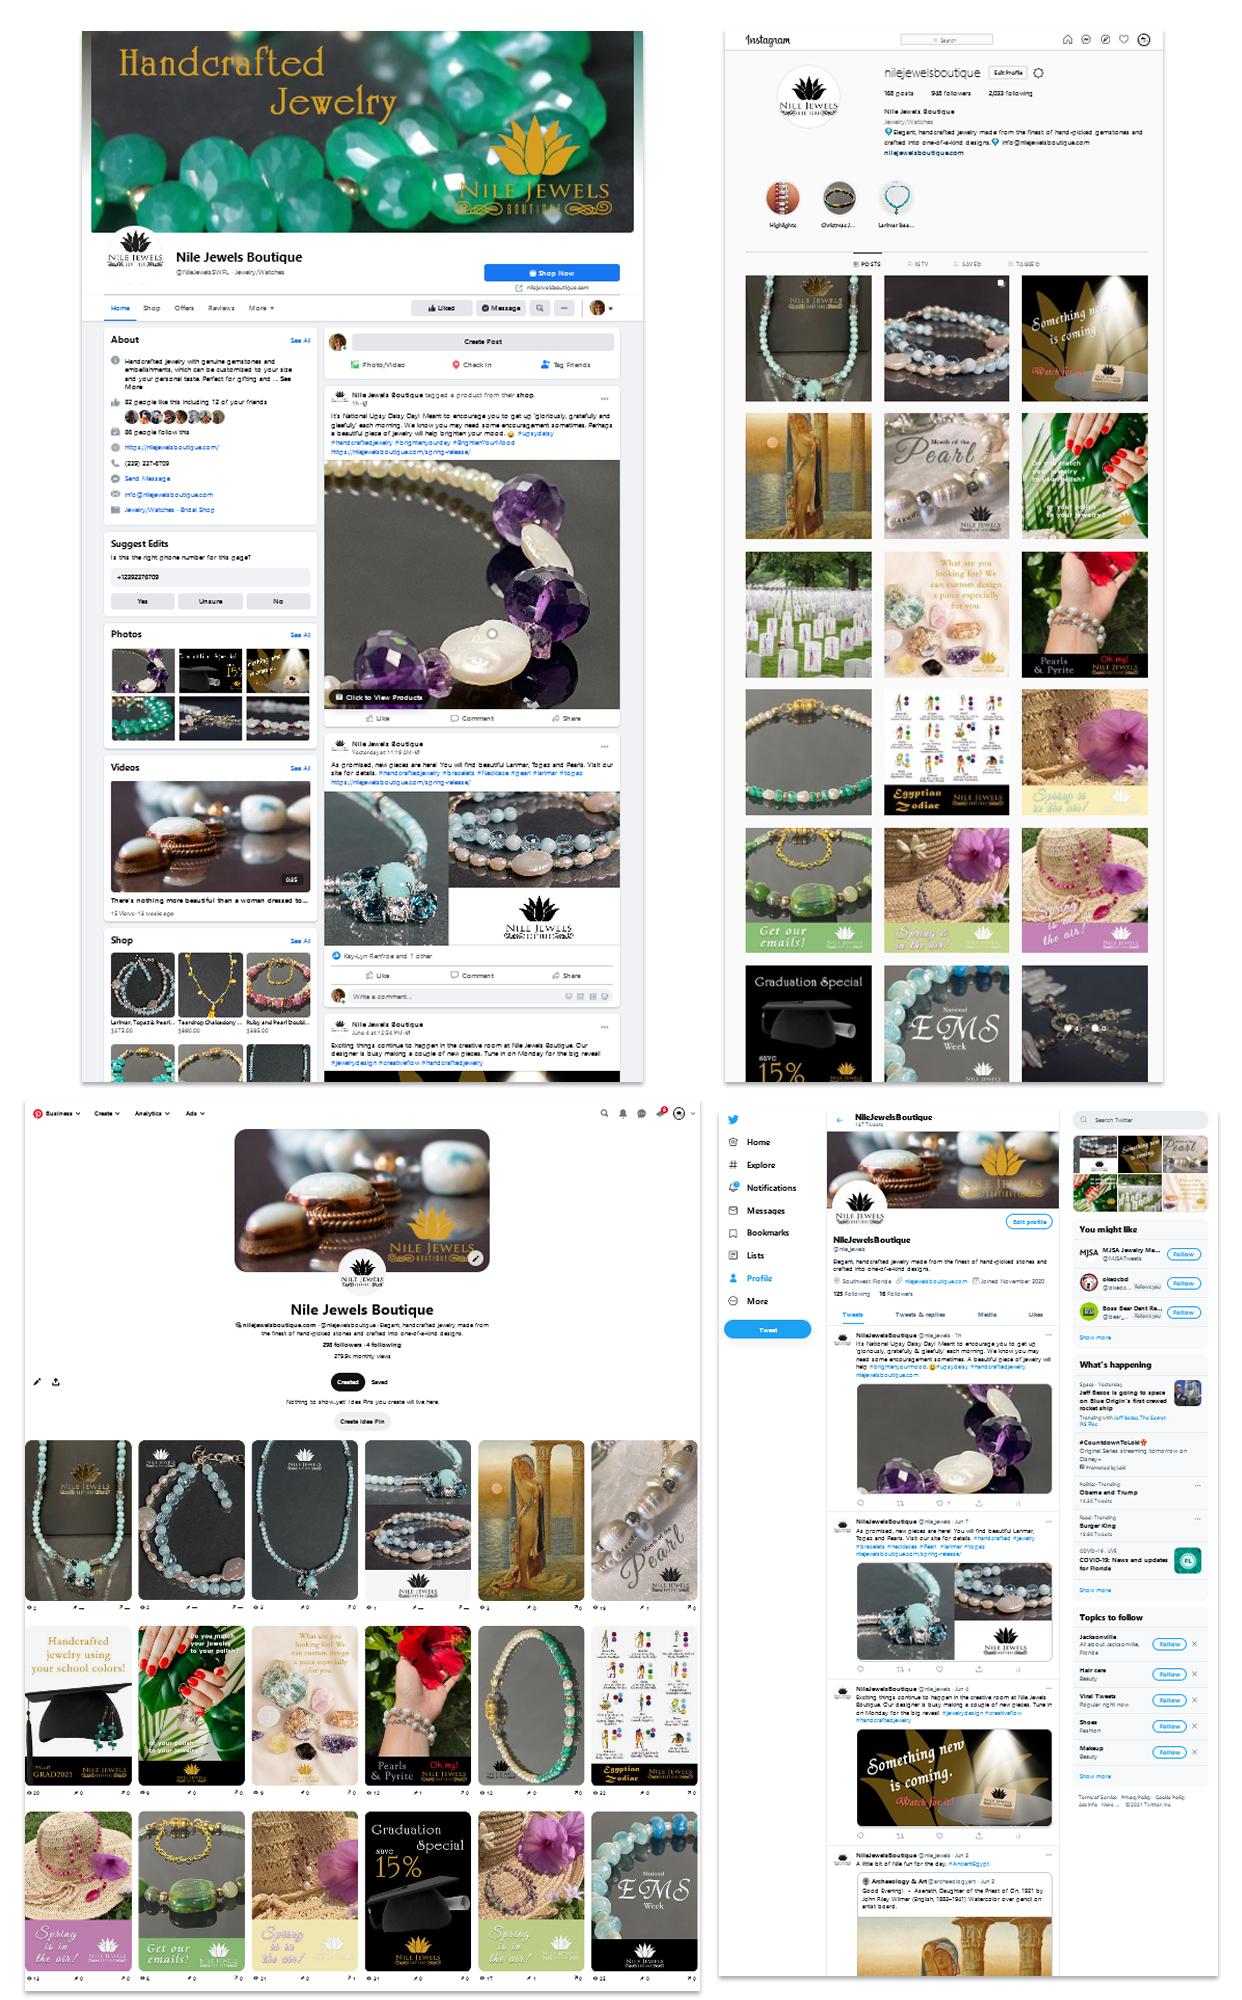 Nile Jewels social media